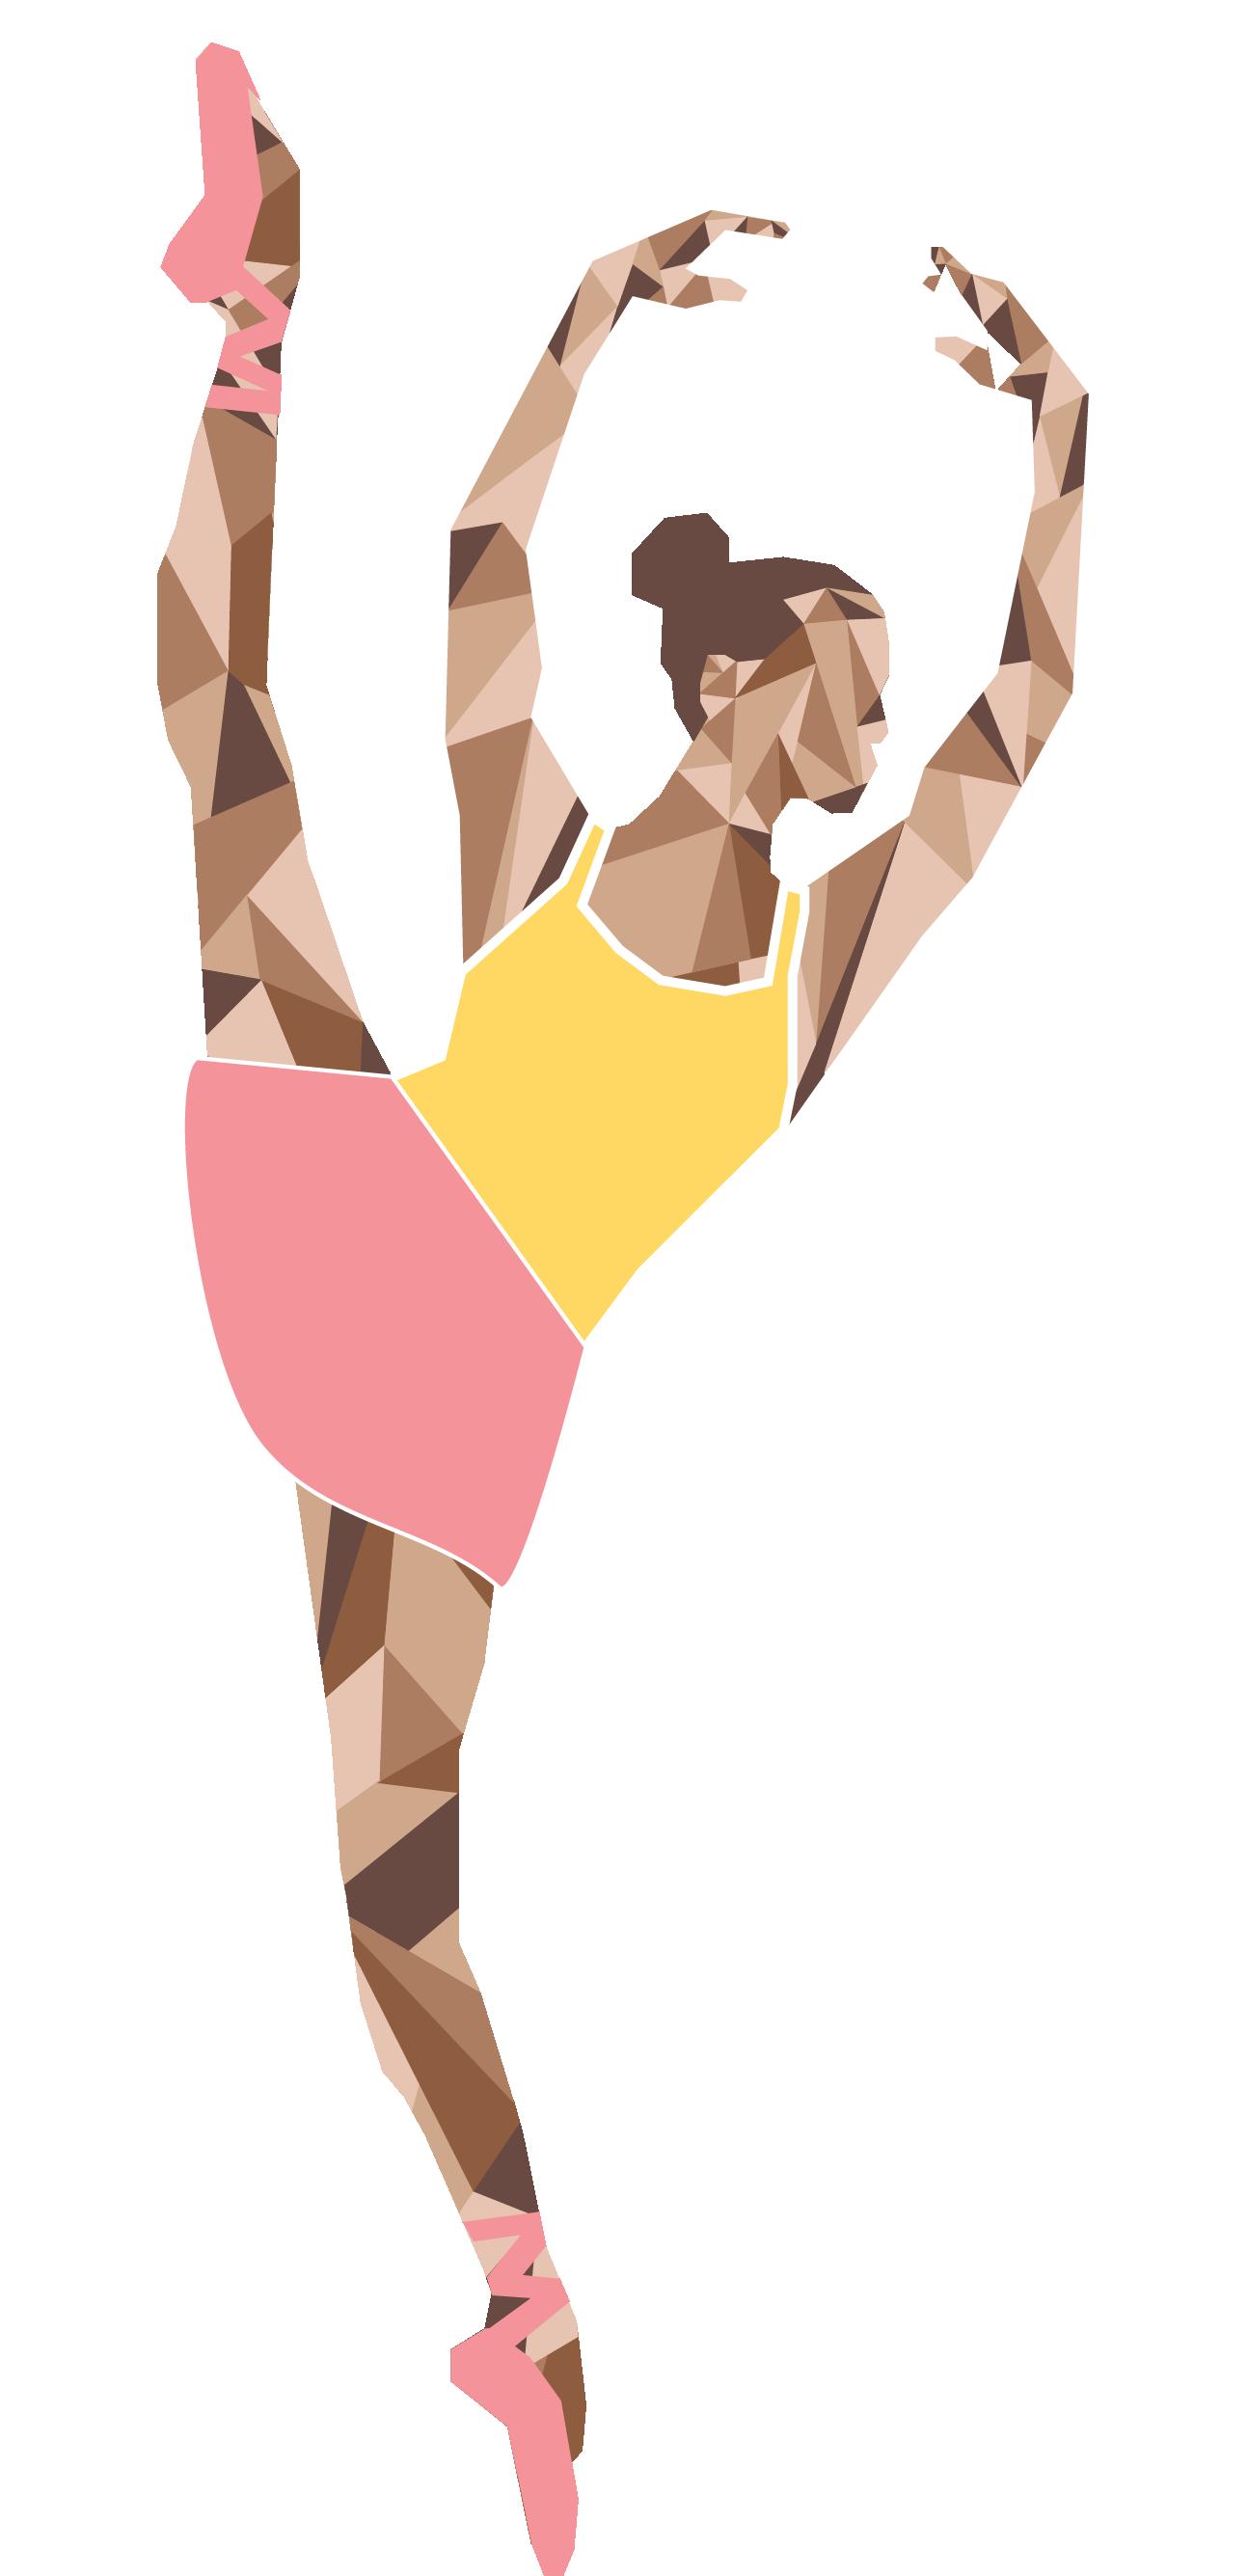 Pencil clipart person. Broadway ballet ballerina dancer